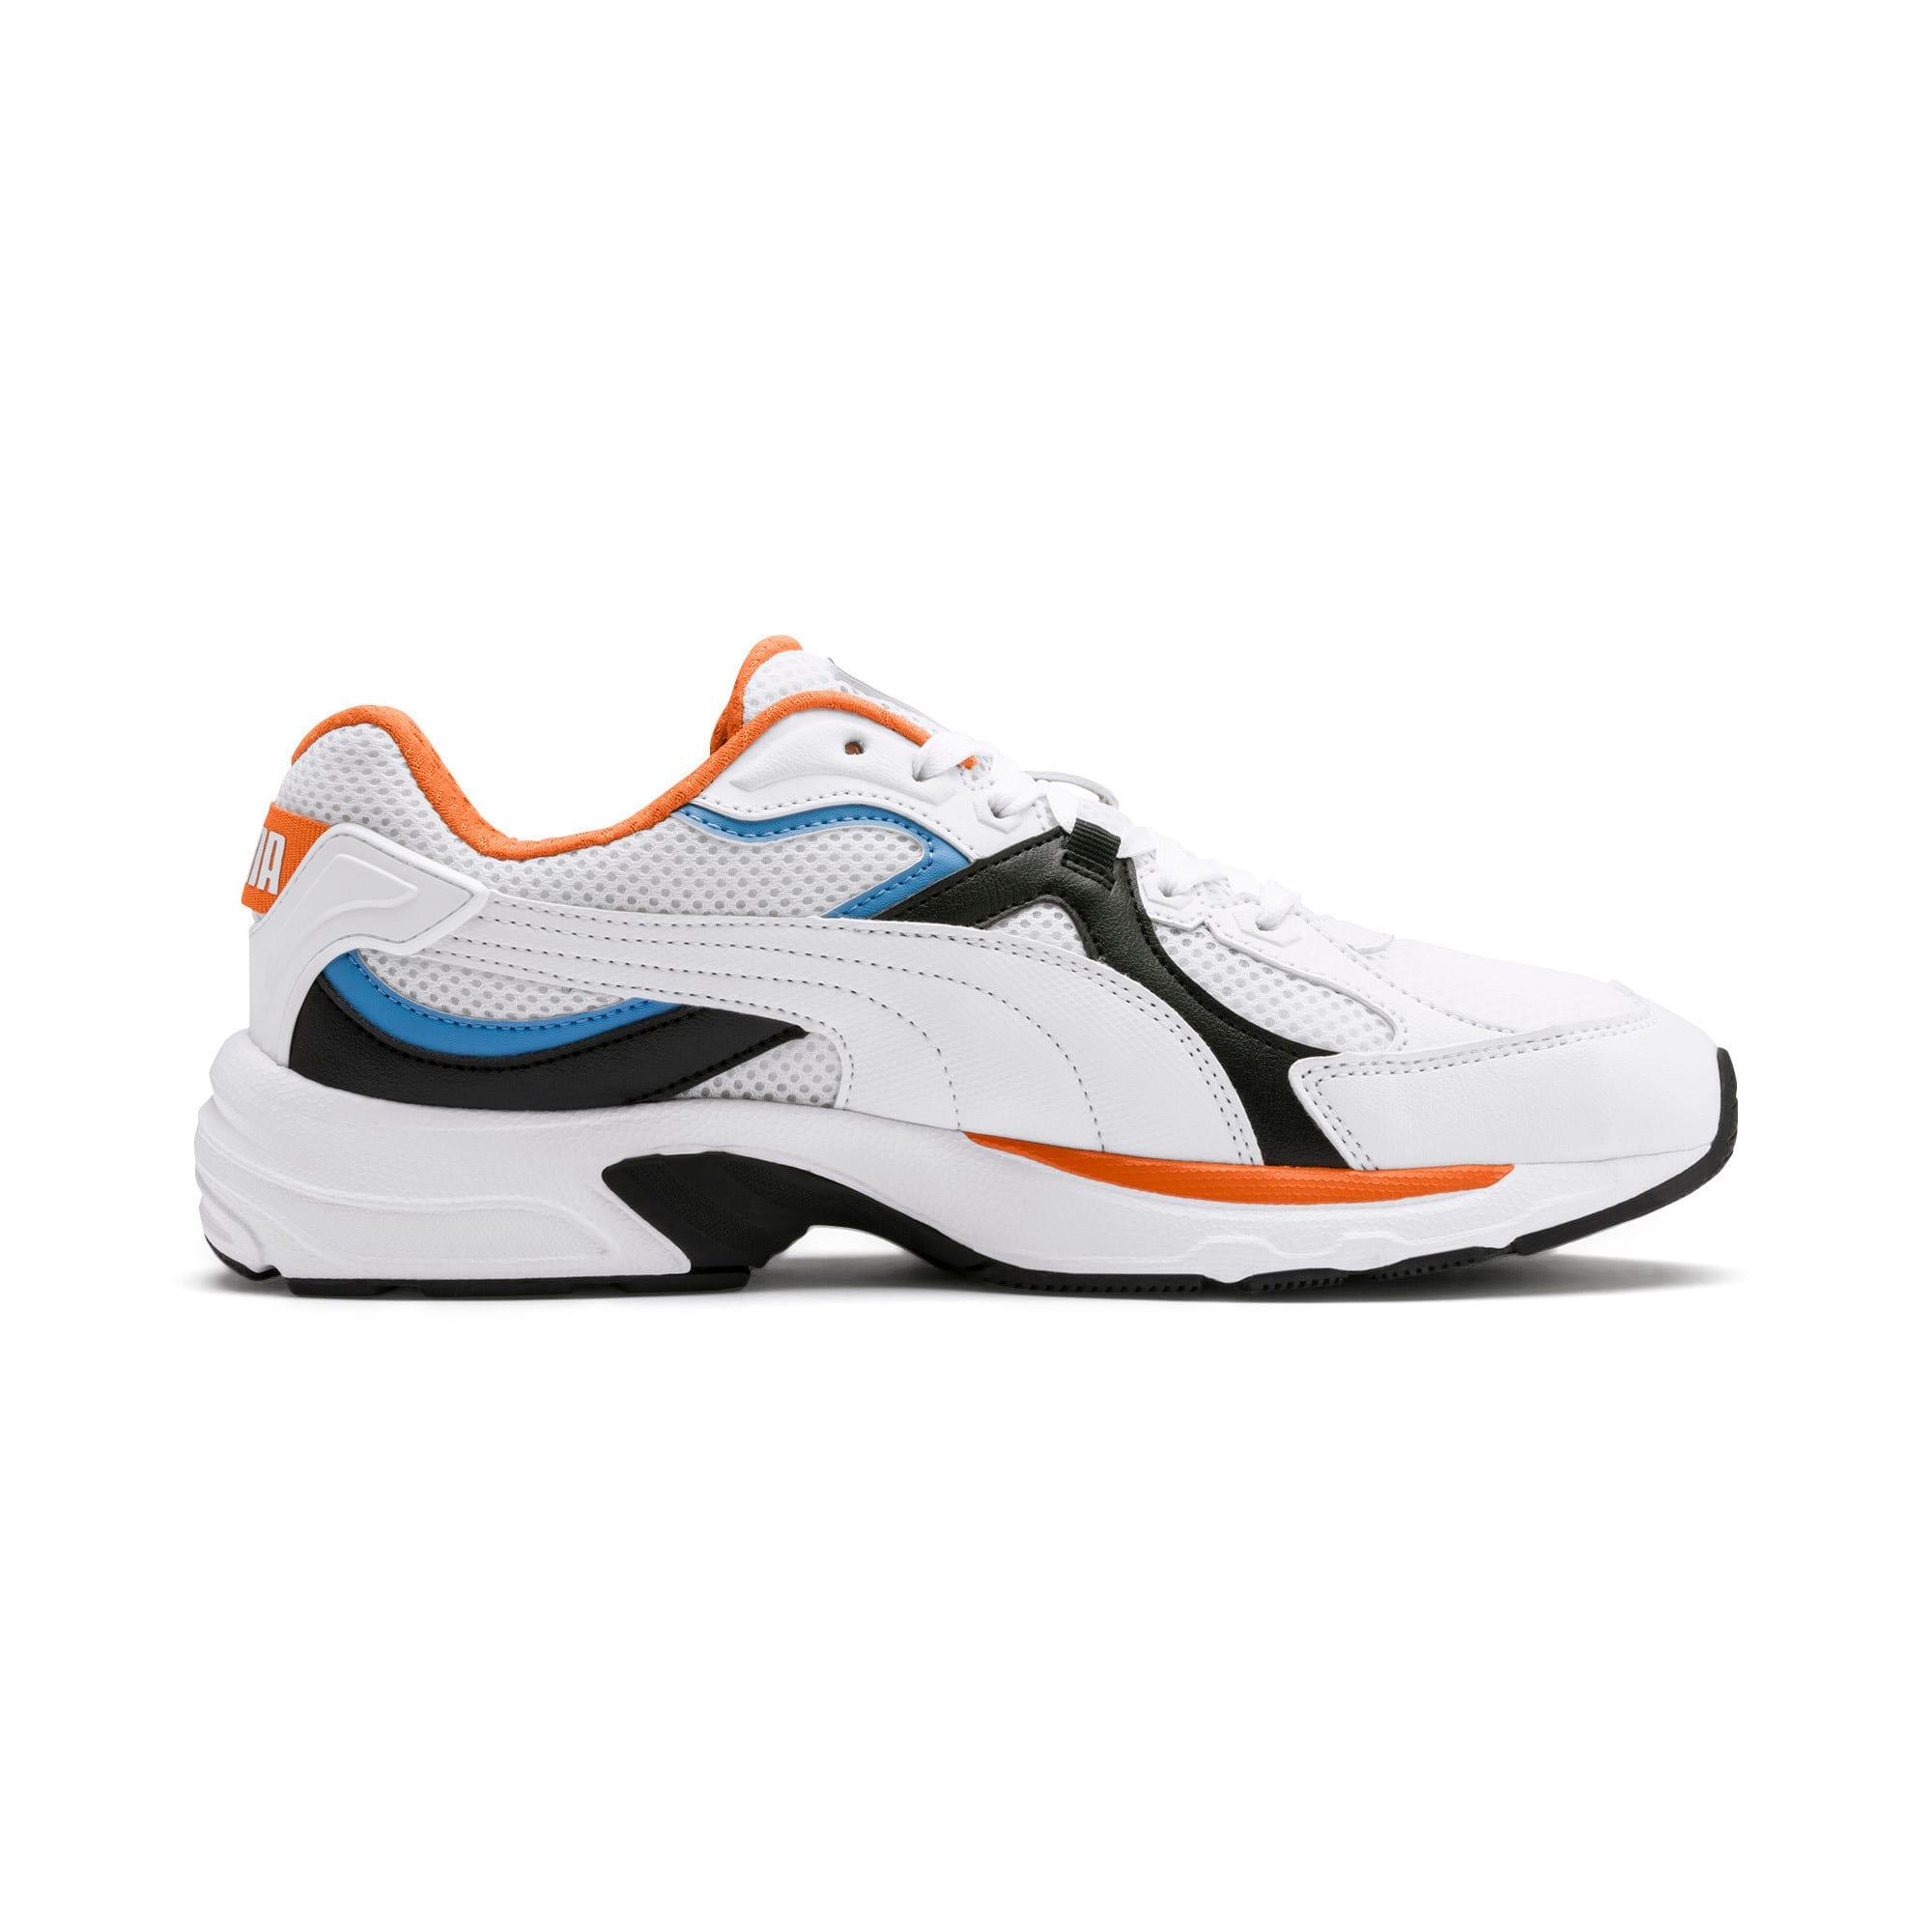 Thumbnail 6 of Axis Plus 90s Sneakers, White-Blk-T Lt Blue-J Orange, medium